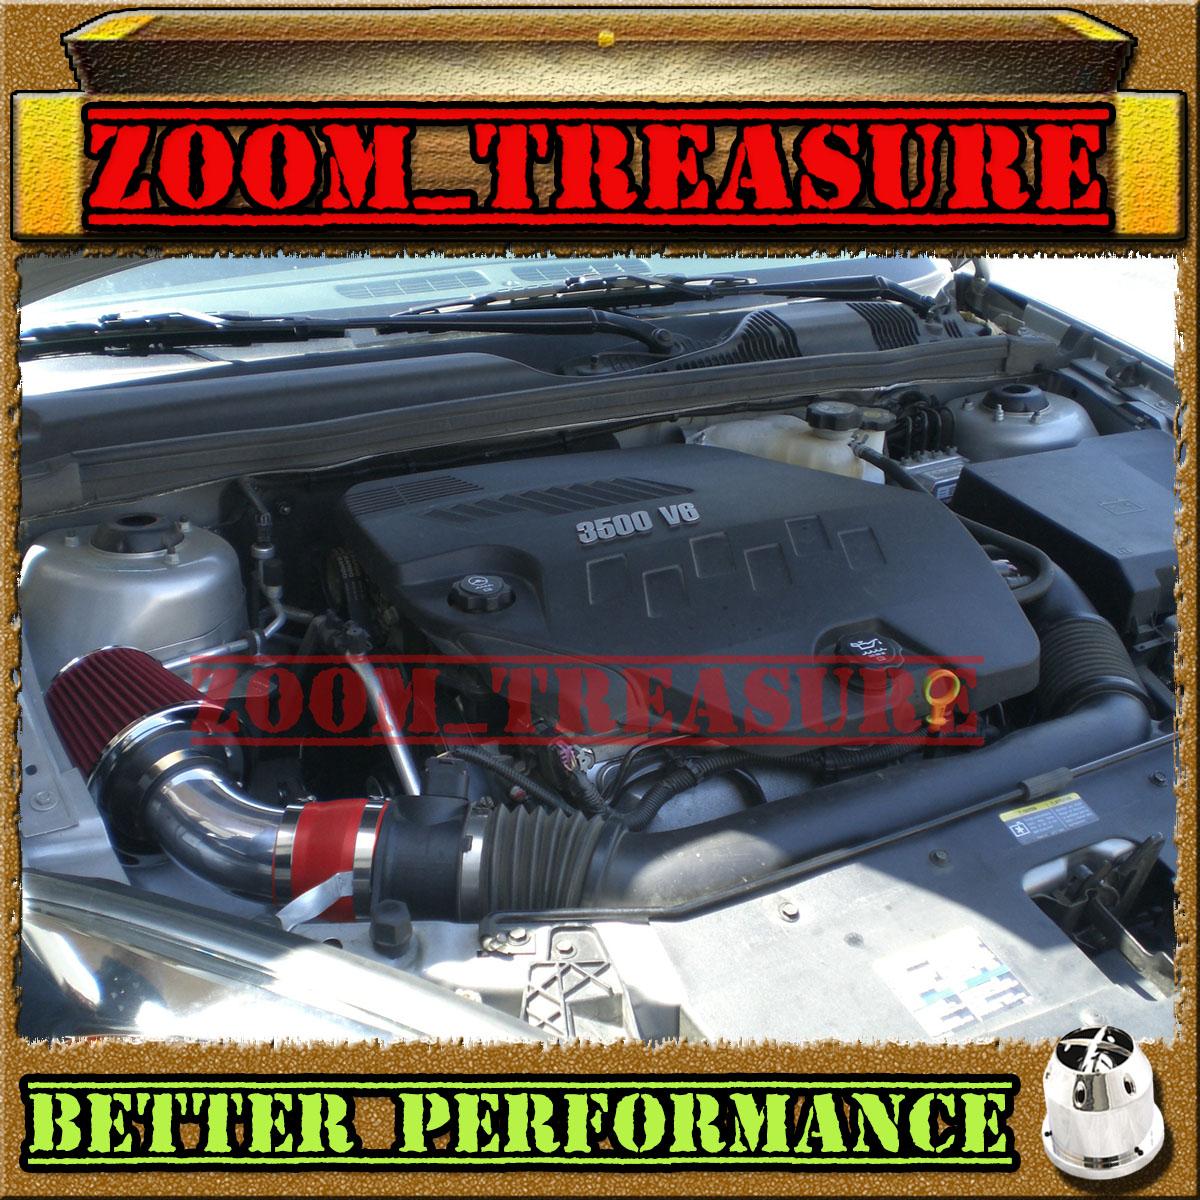 RED CHF 2004-2010//04-10 CHEVY MALIBU//PONTIAC G6 3.5 3.5L V6 AIR INTAKE KIT